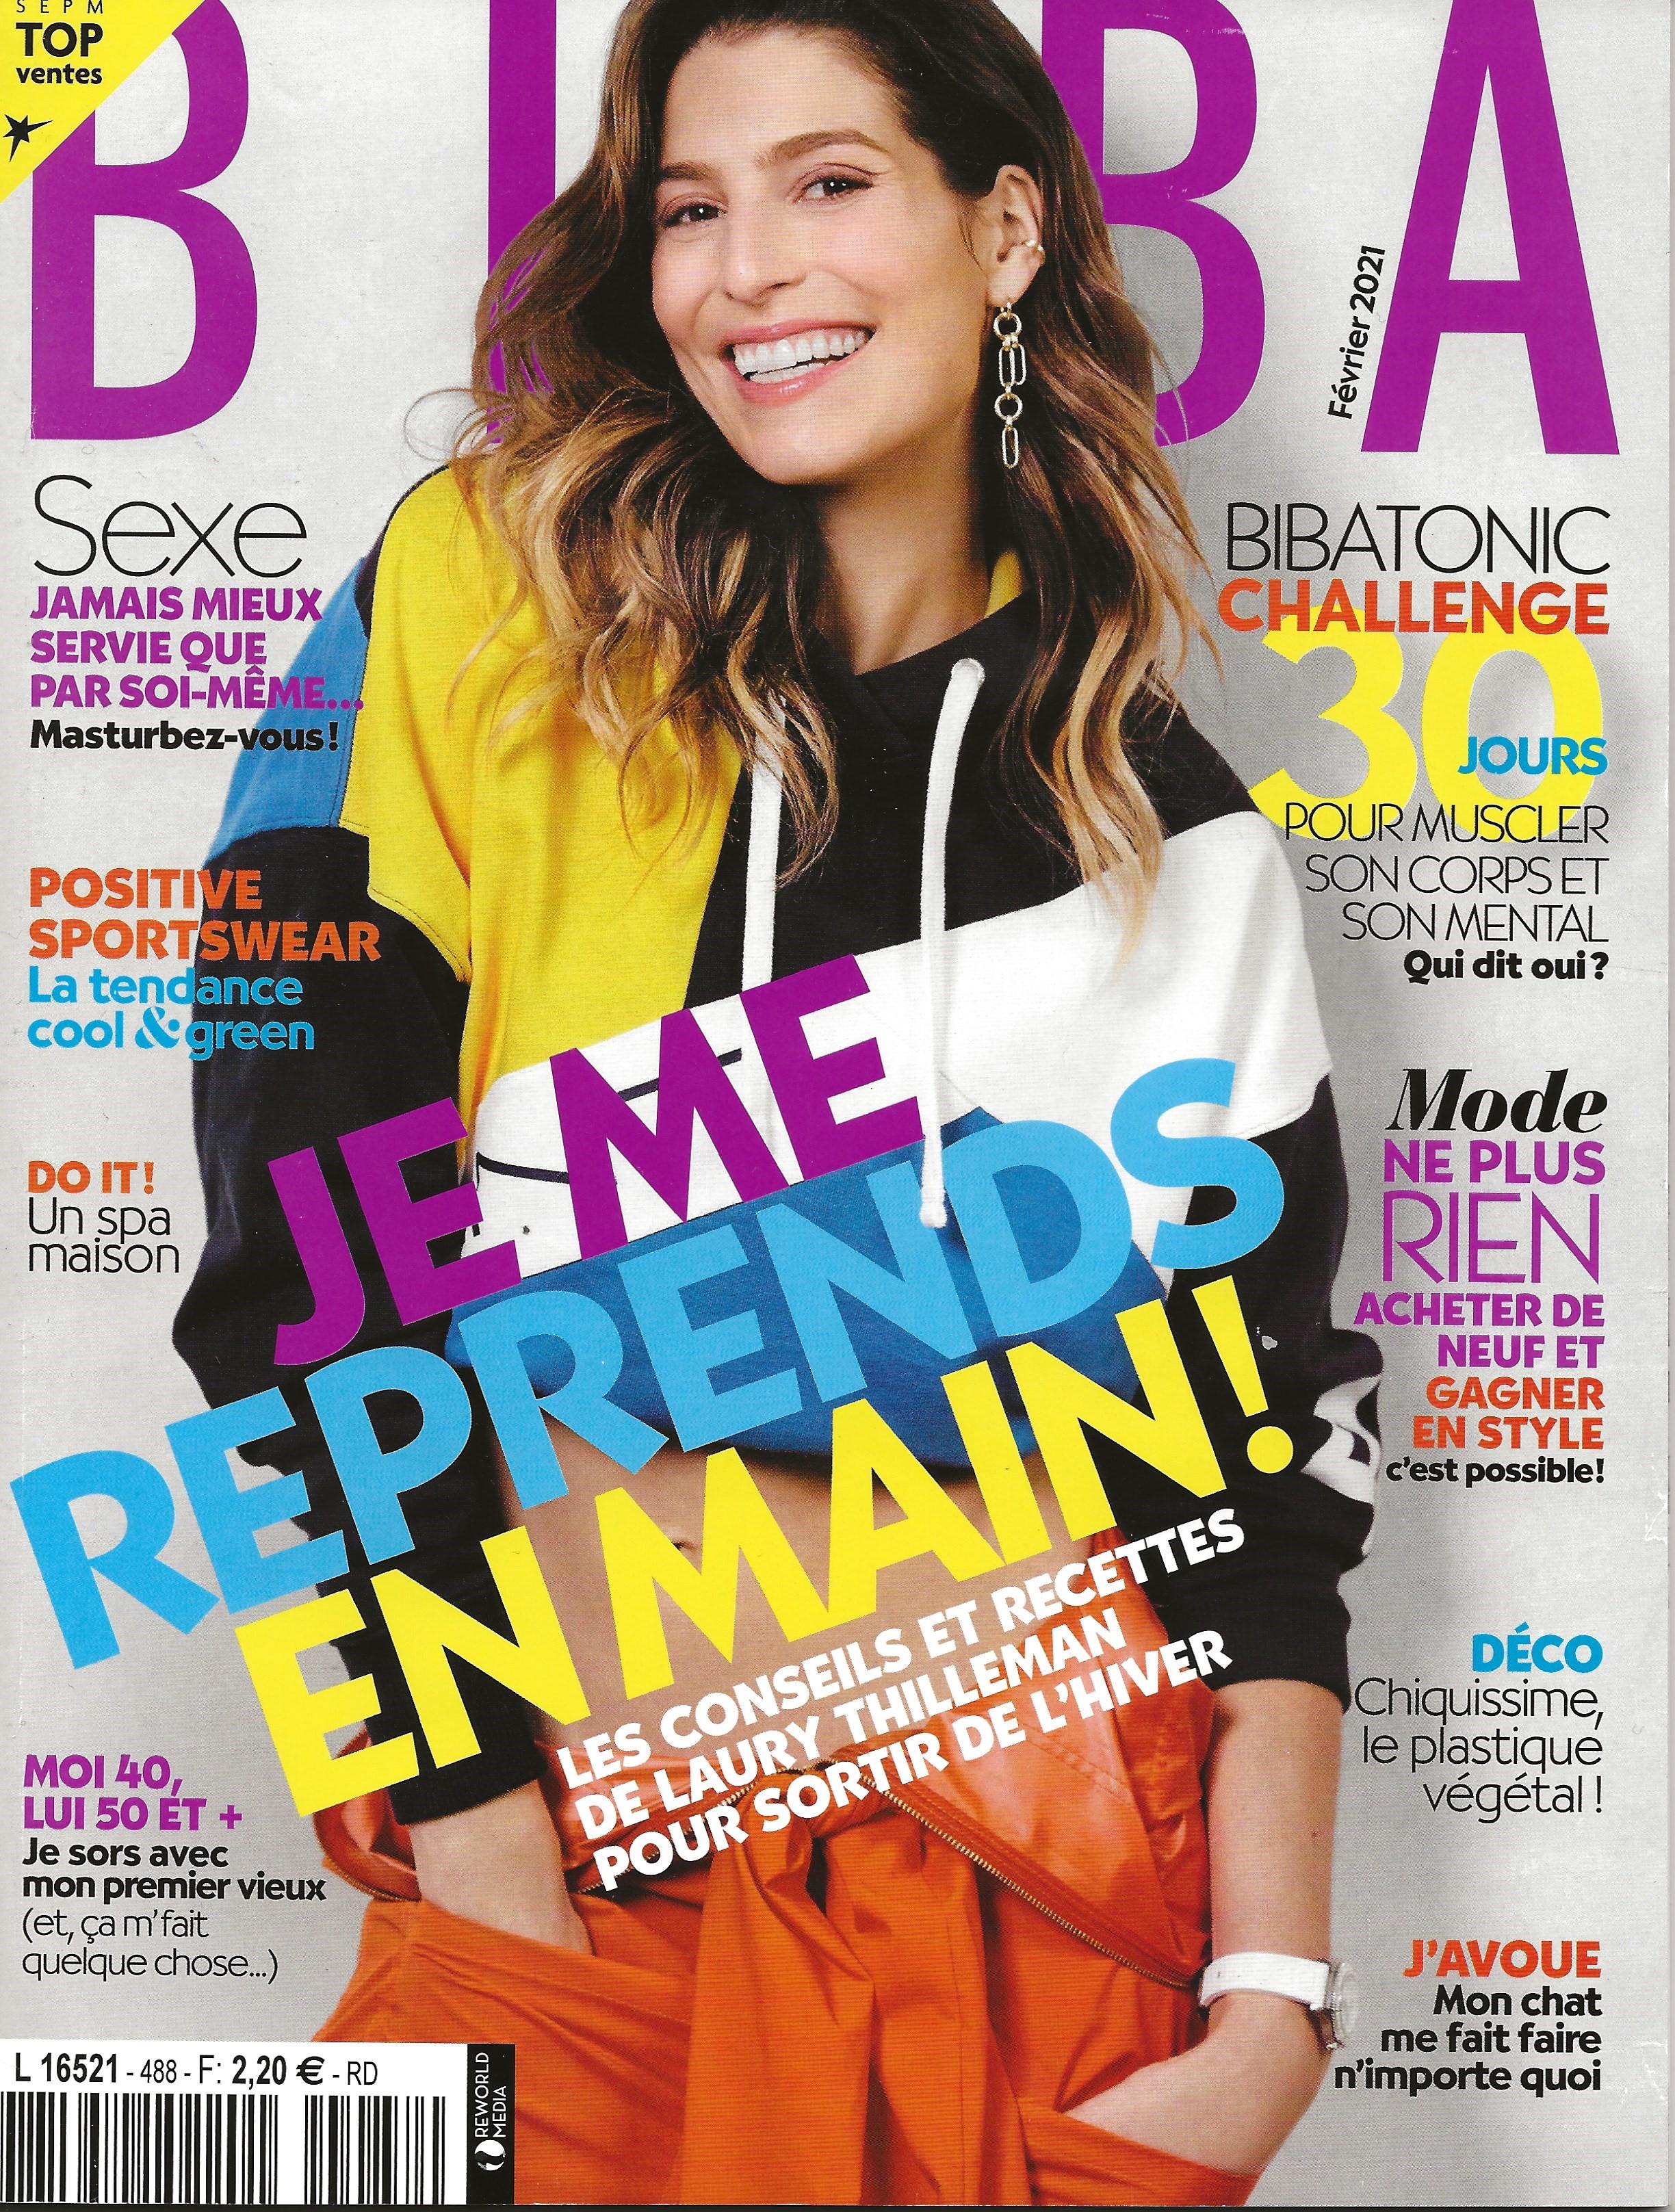 dada-diane-ducasse-biba-presse-fevrier-2021-1